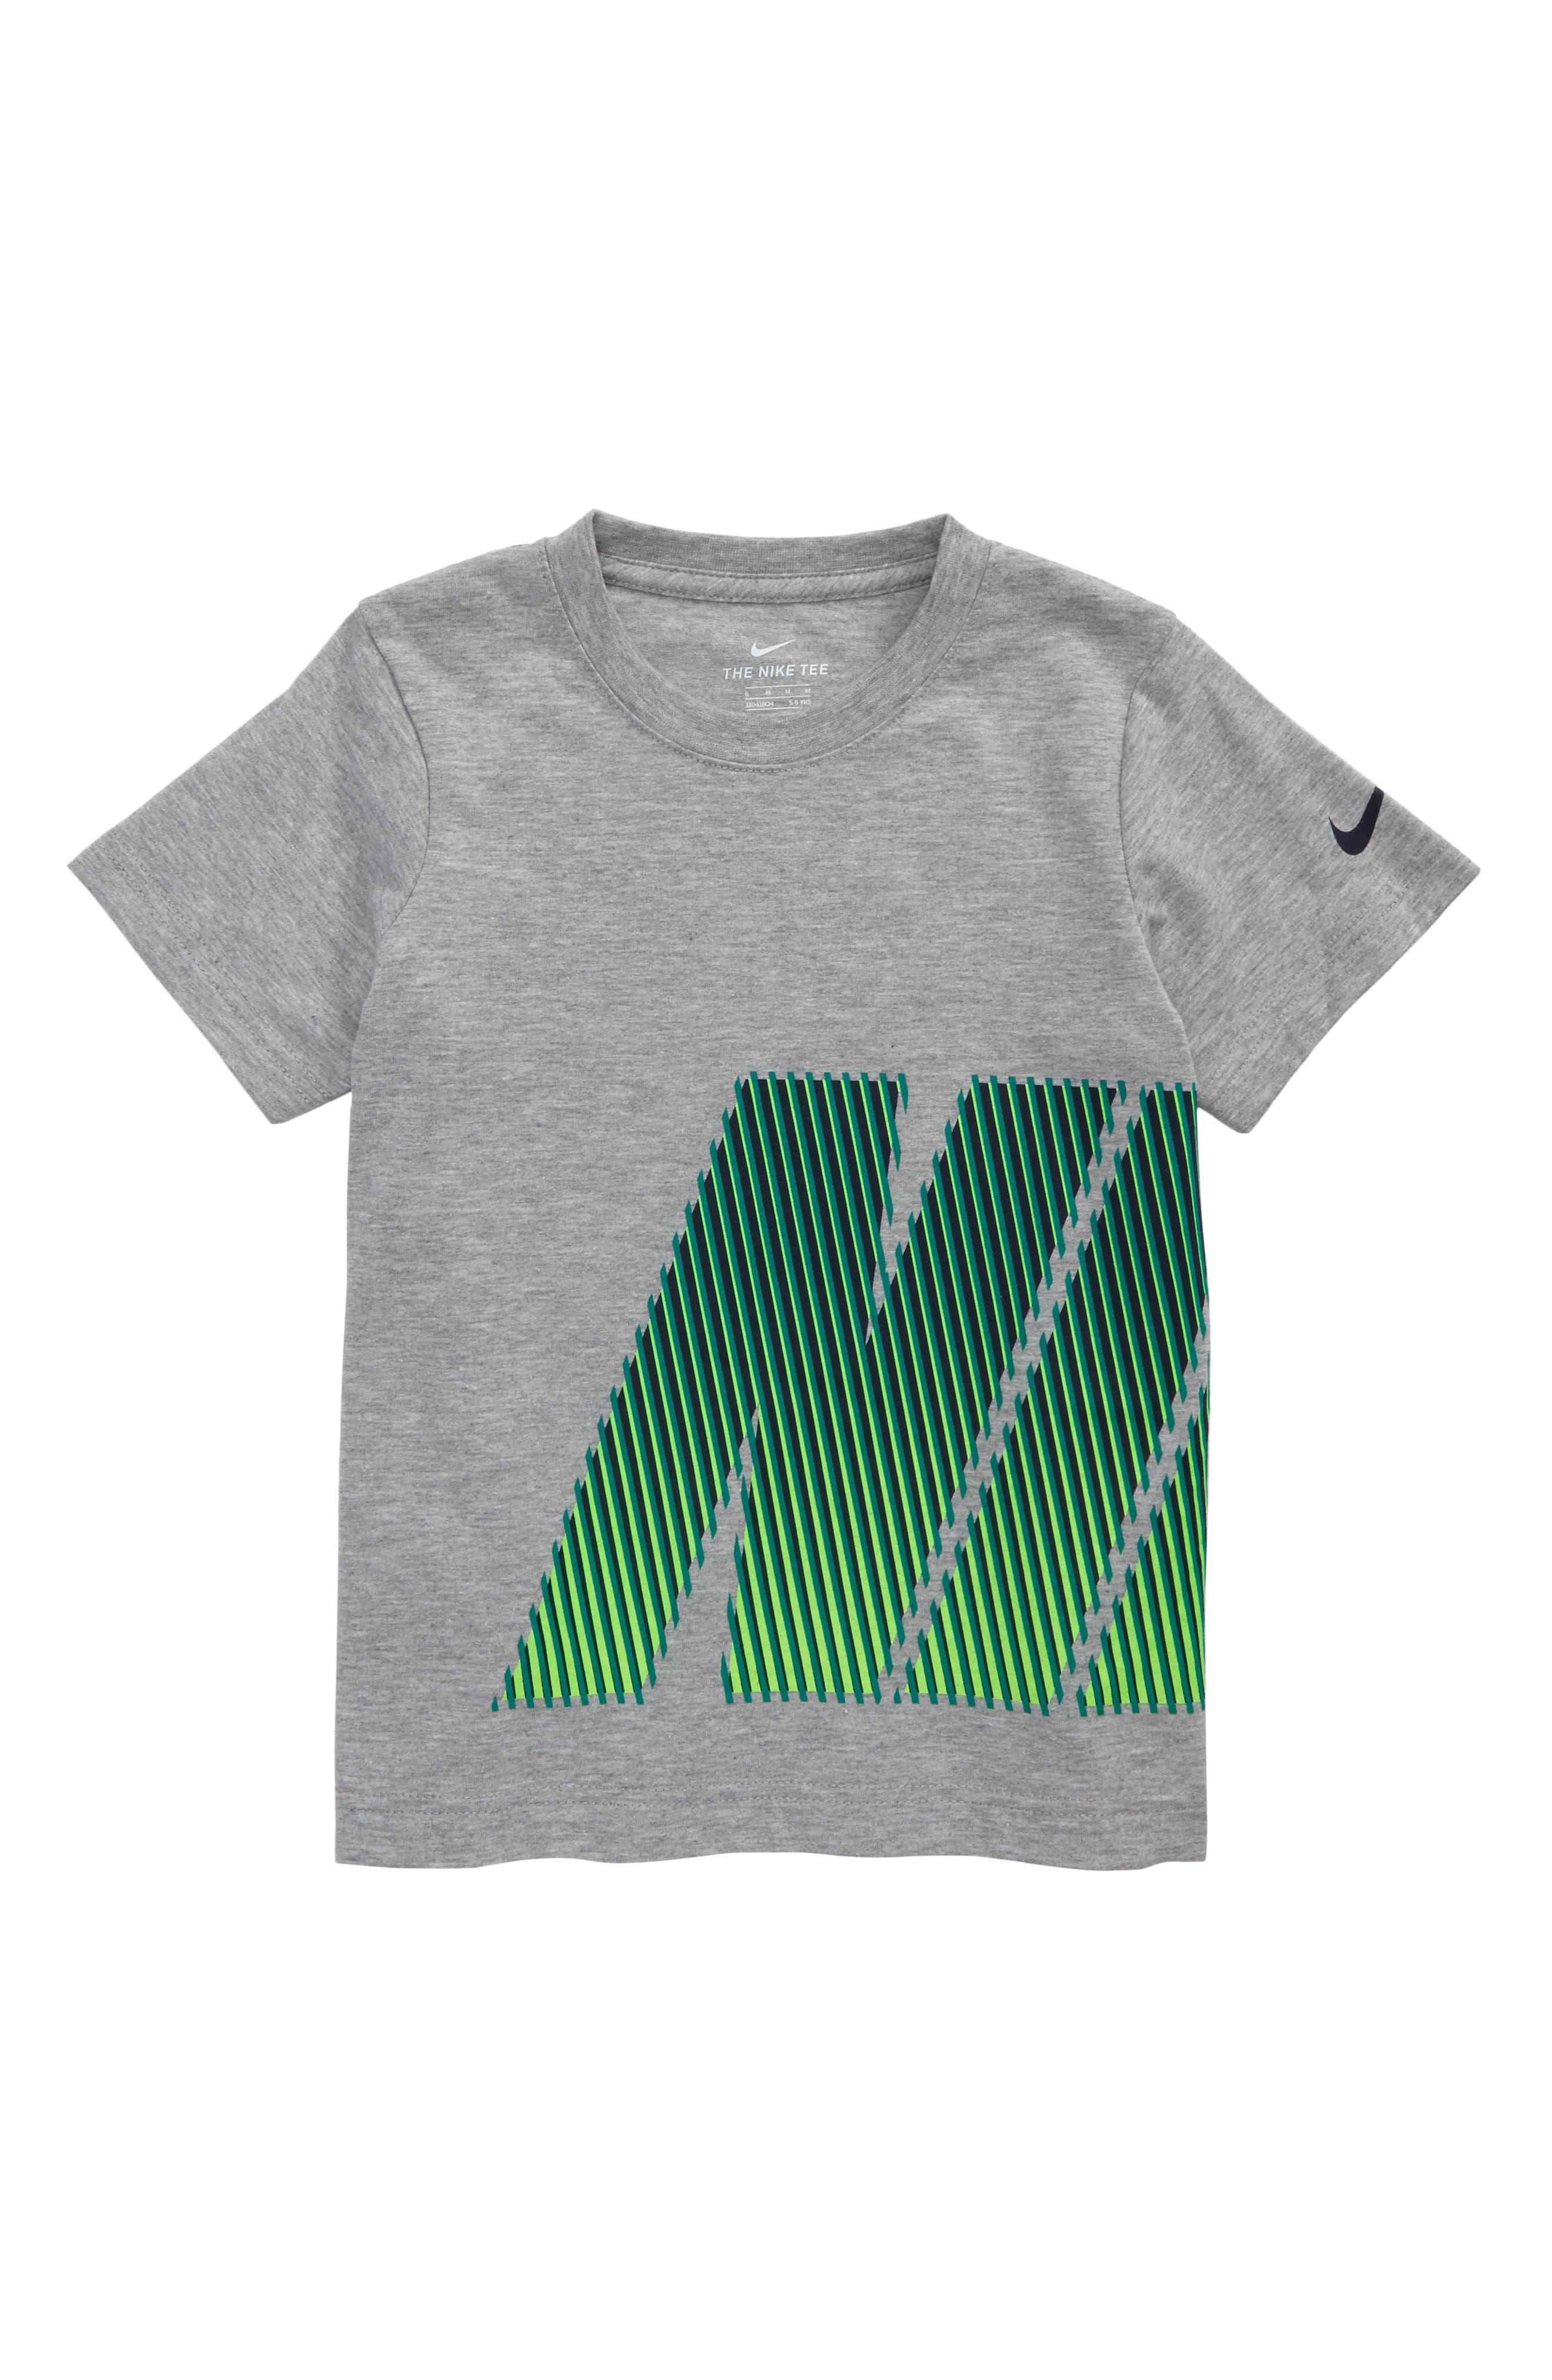 Main Image - Nike Lenticular Logo Graphic T-Shirt (Toddler Boys & Little Boys)